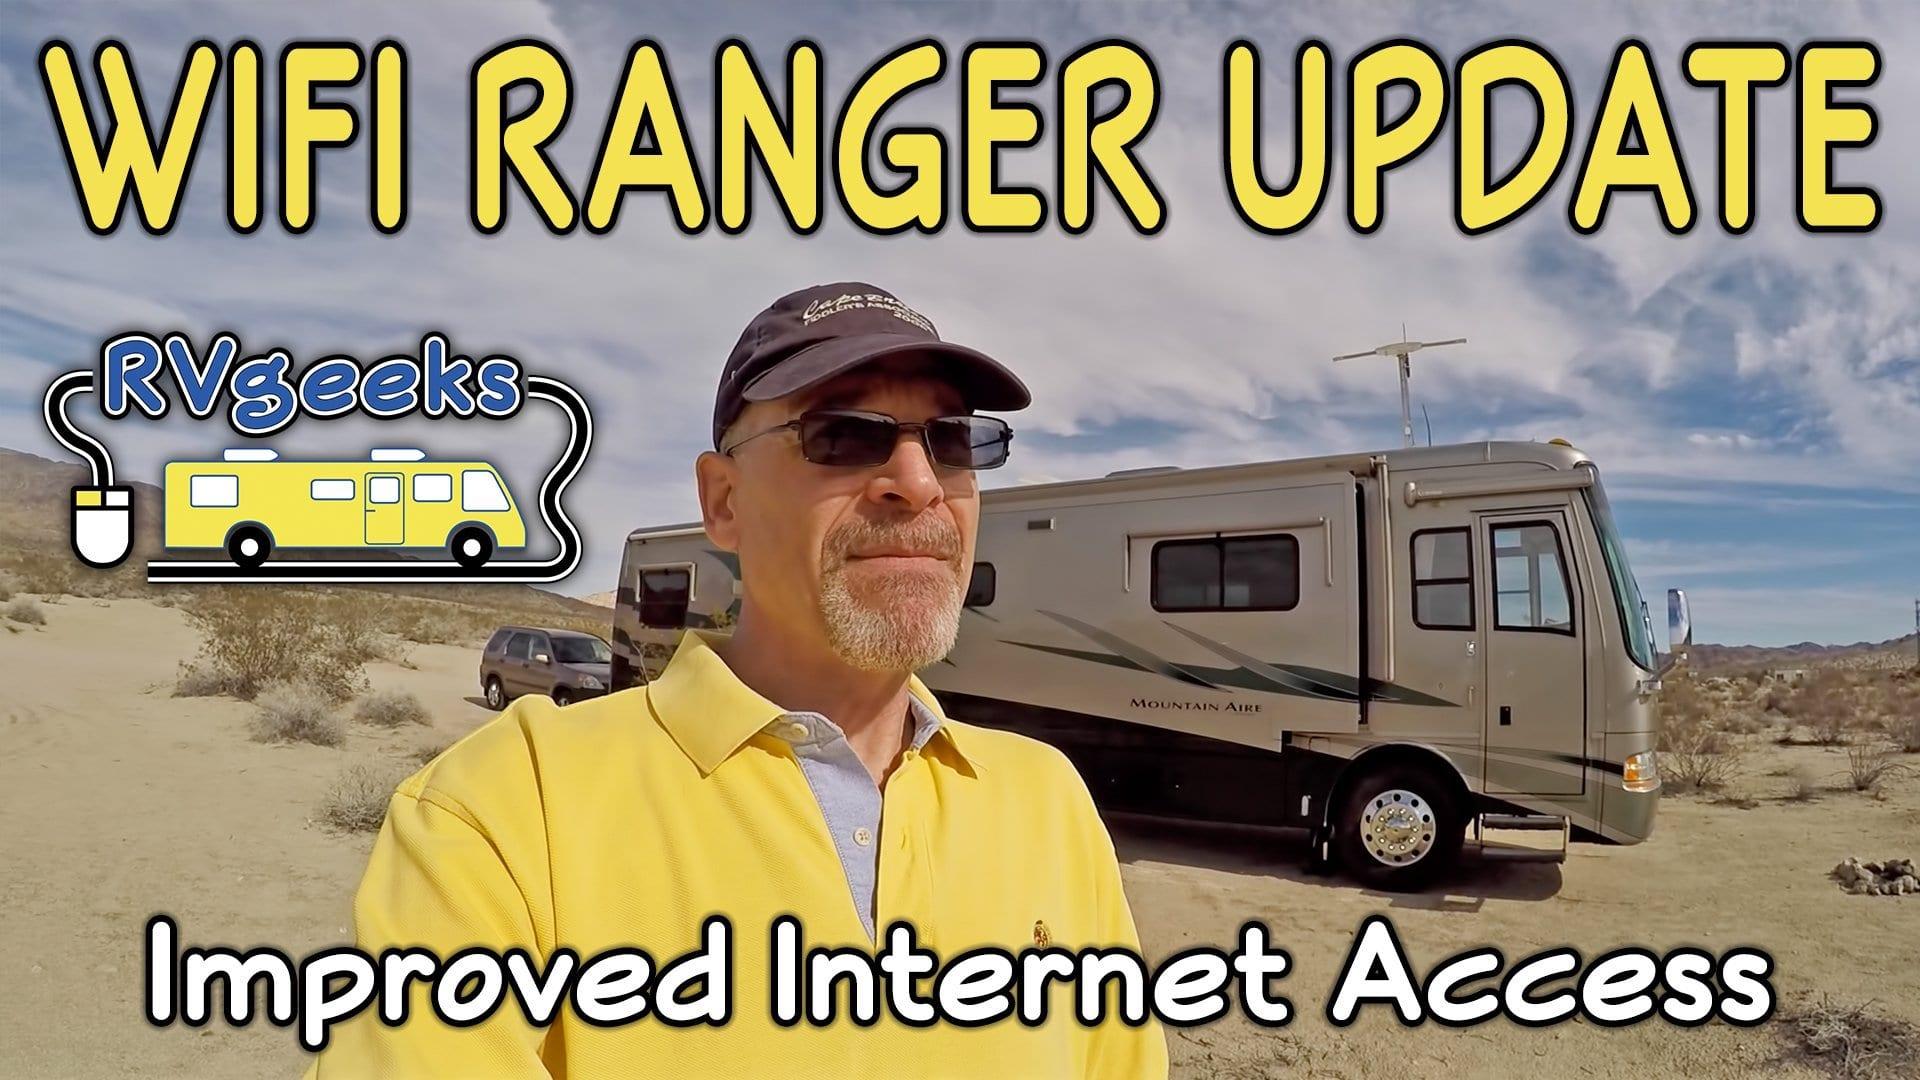 WiFiRanger Update: Improved Internet Access